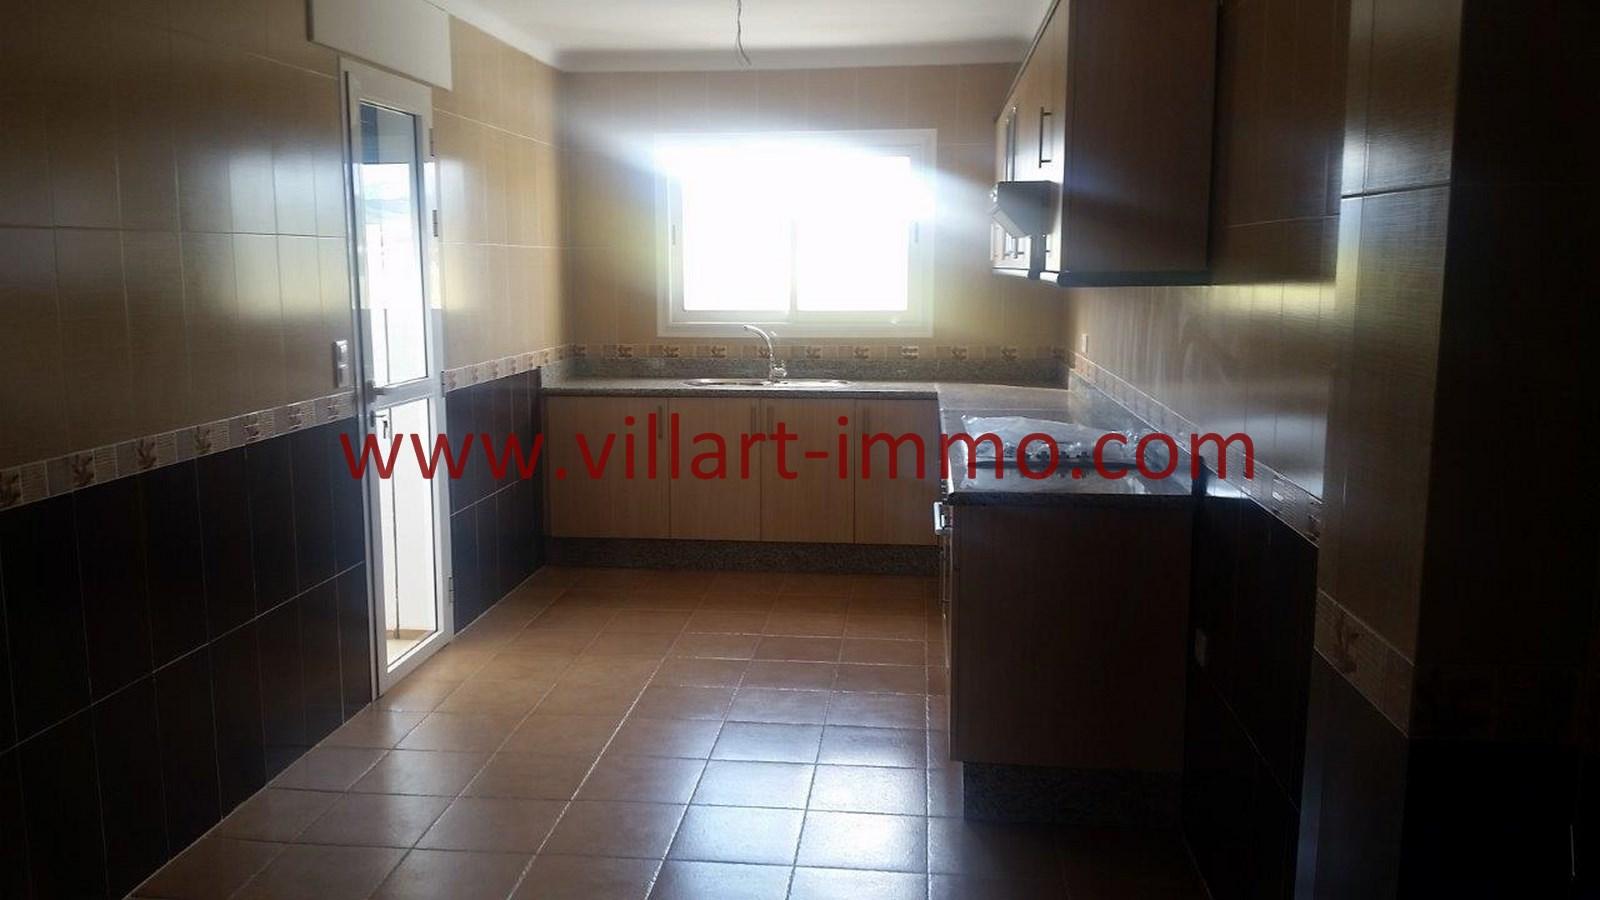 2-vente-appartement-region-tetouan-mdiq-cuisine-1-va395-villart-immo